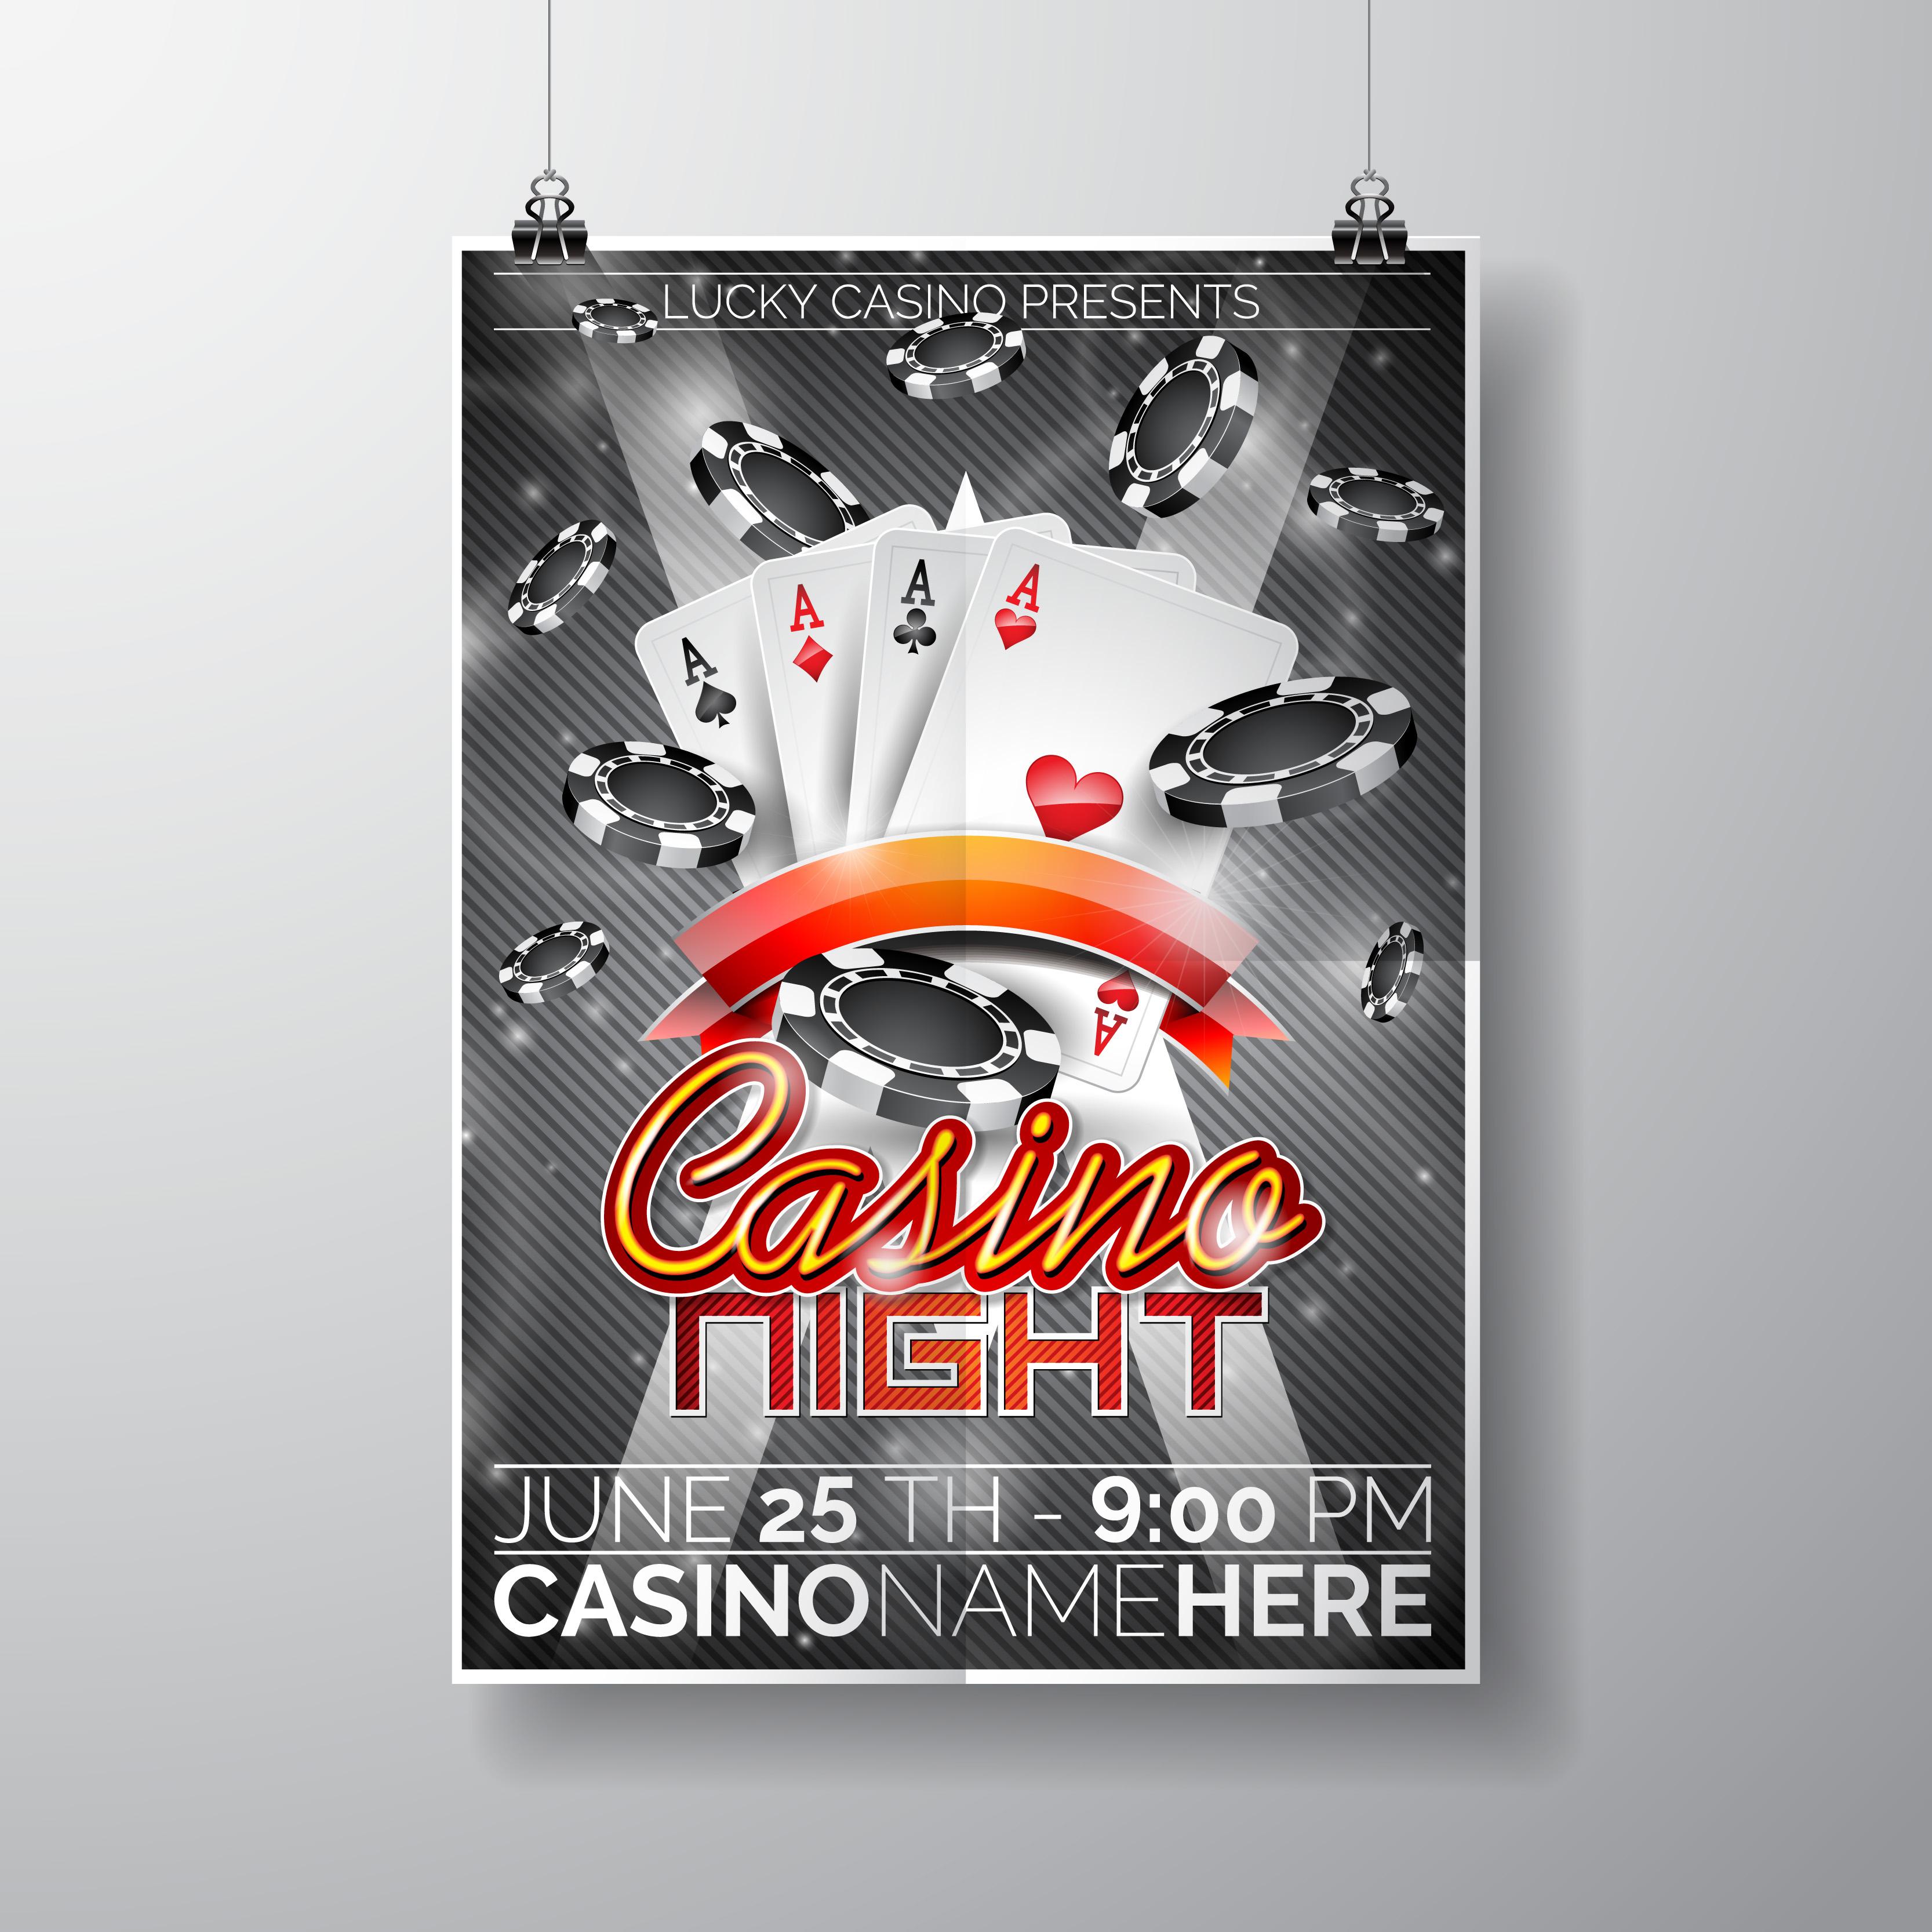 Silversands online mobile casino